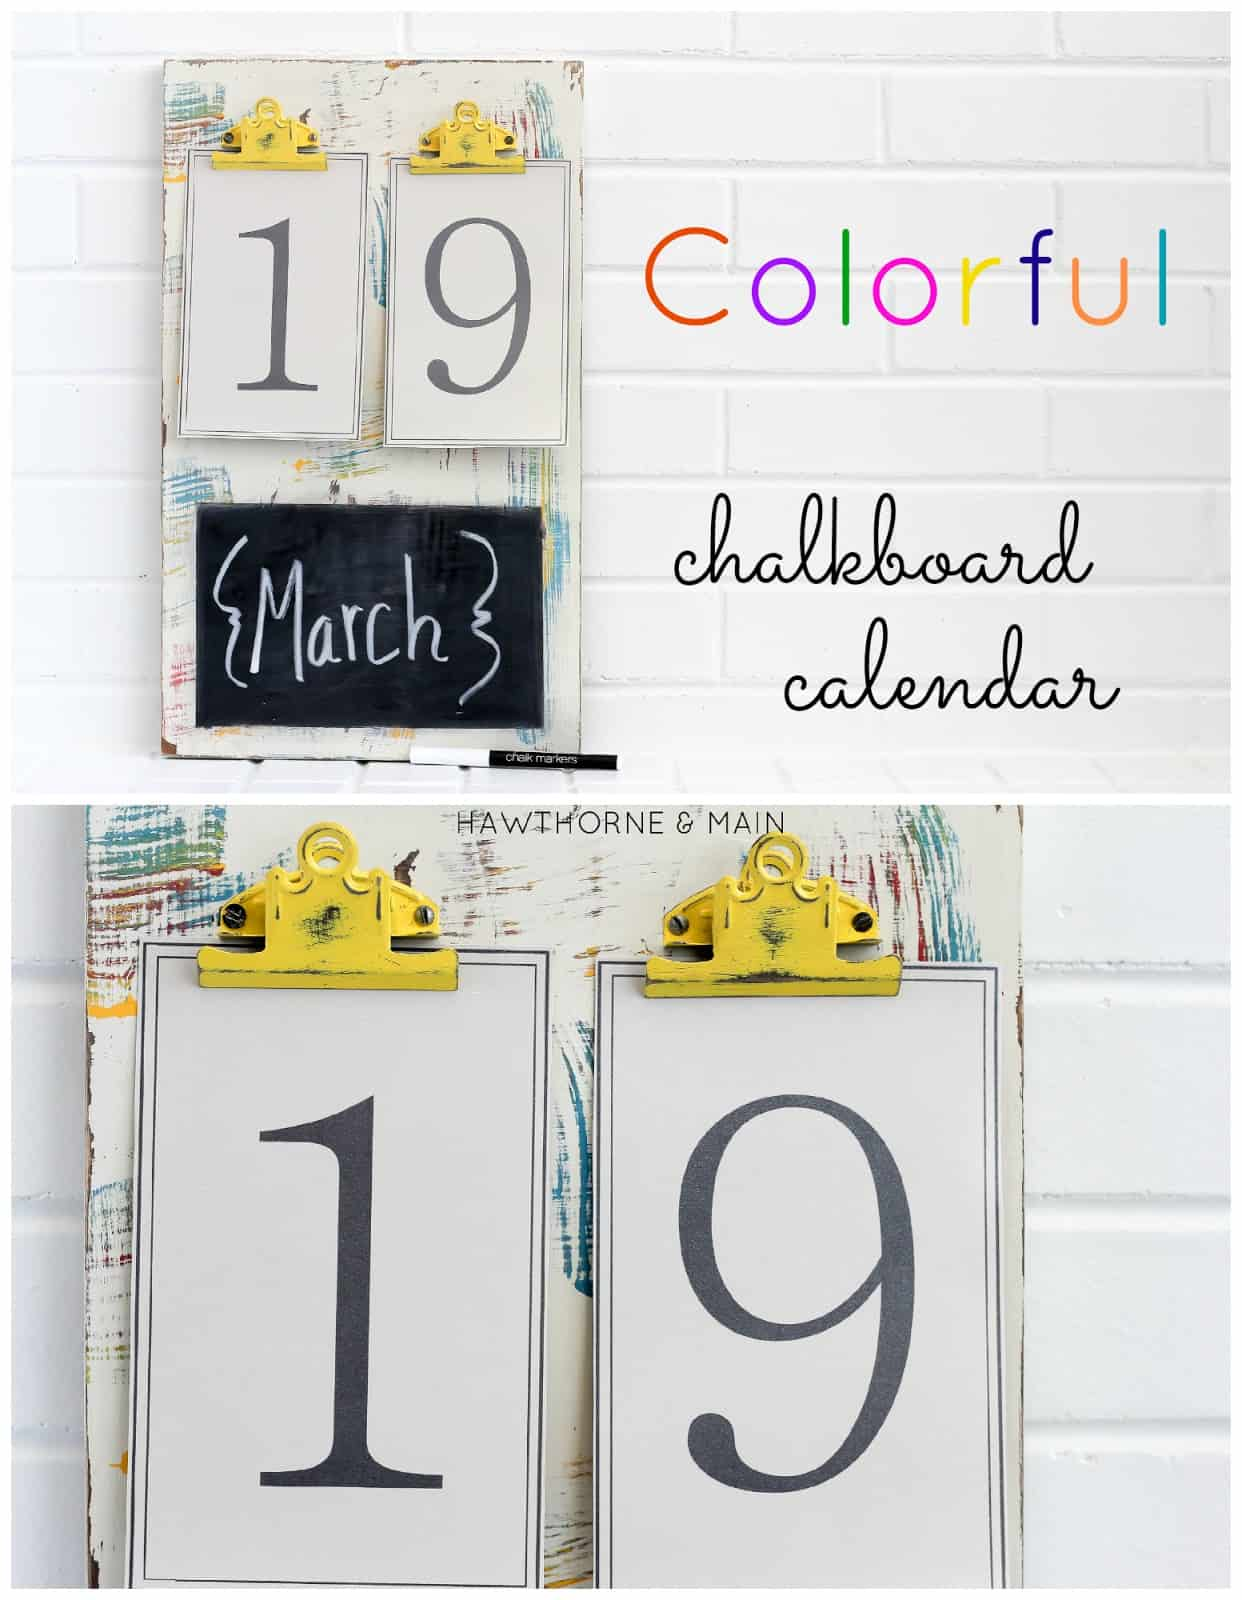 Colourful chalkboard wall calendar